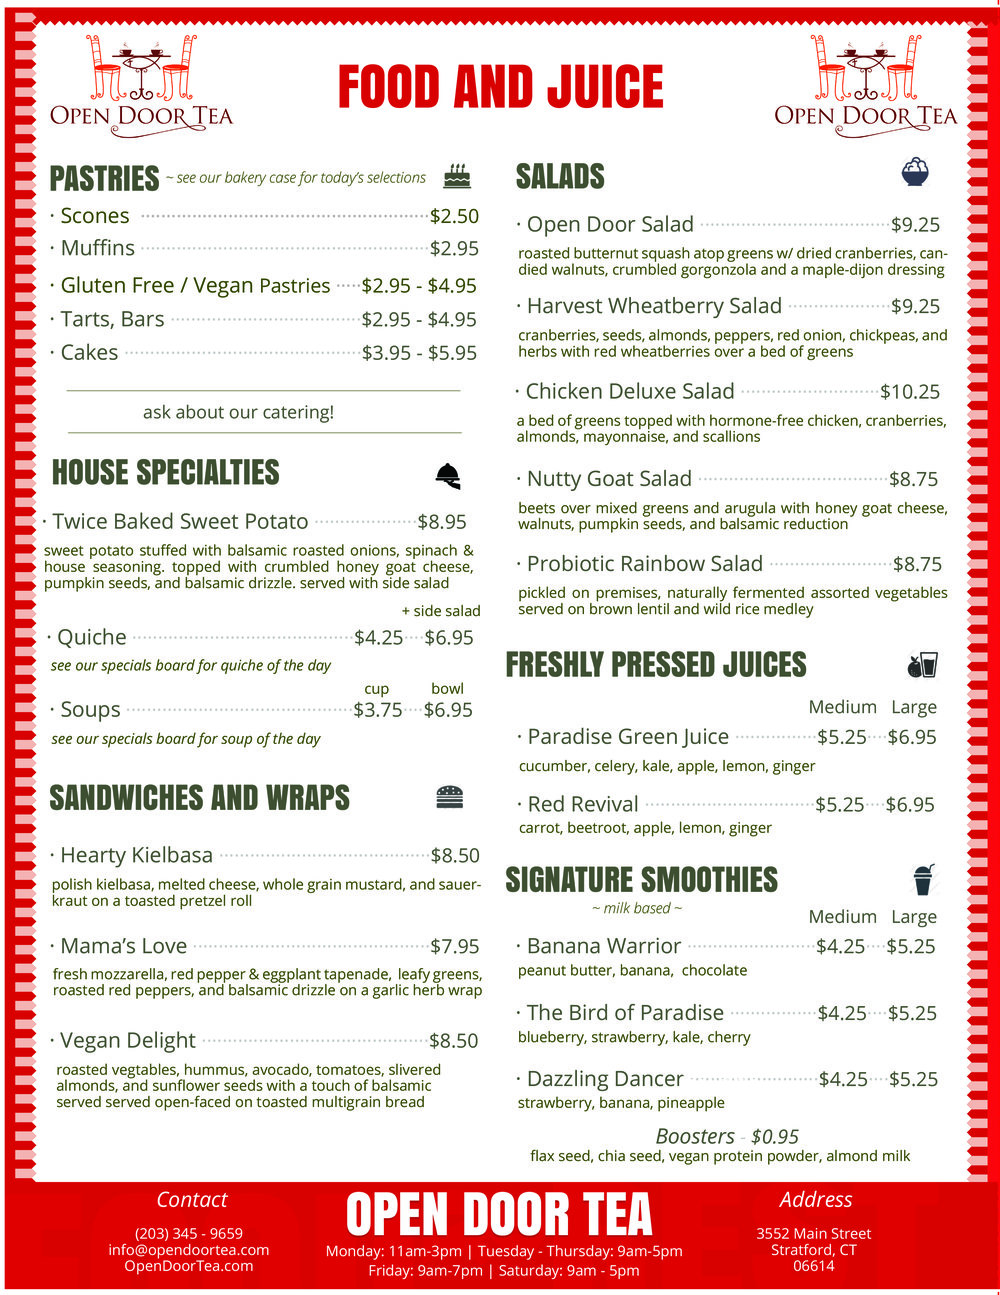 Food Menu v.9.6 page 1.jpg